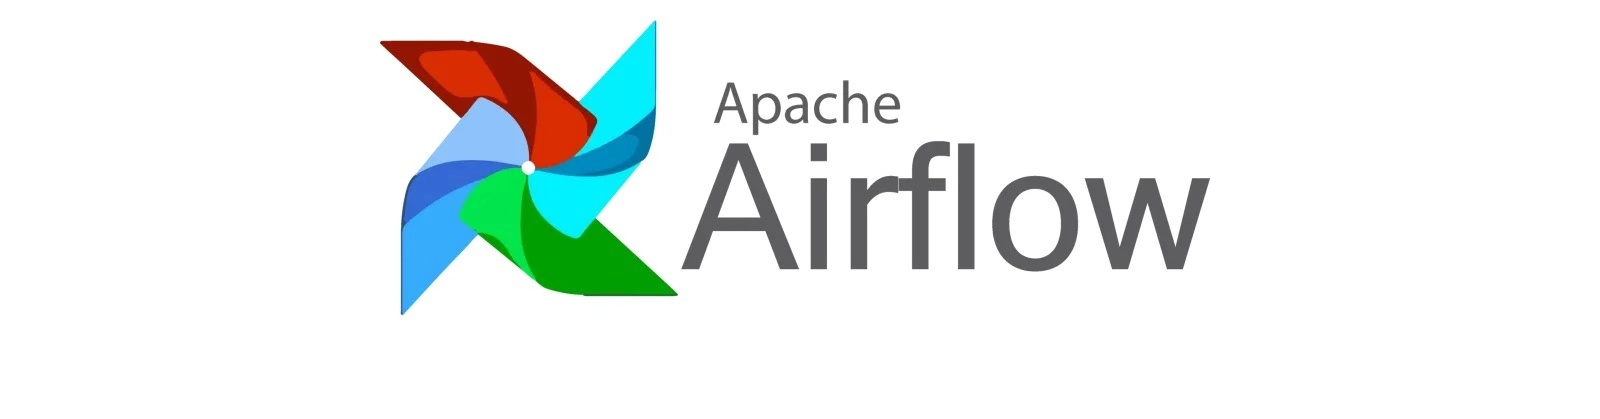 Airflow 使用及原理分析